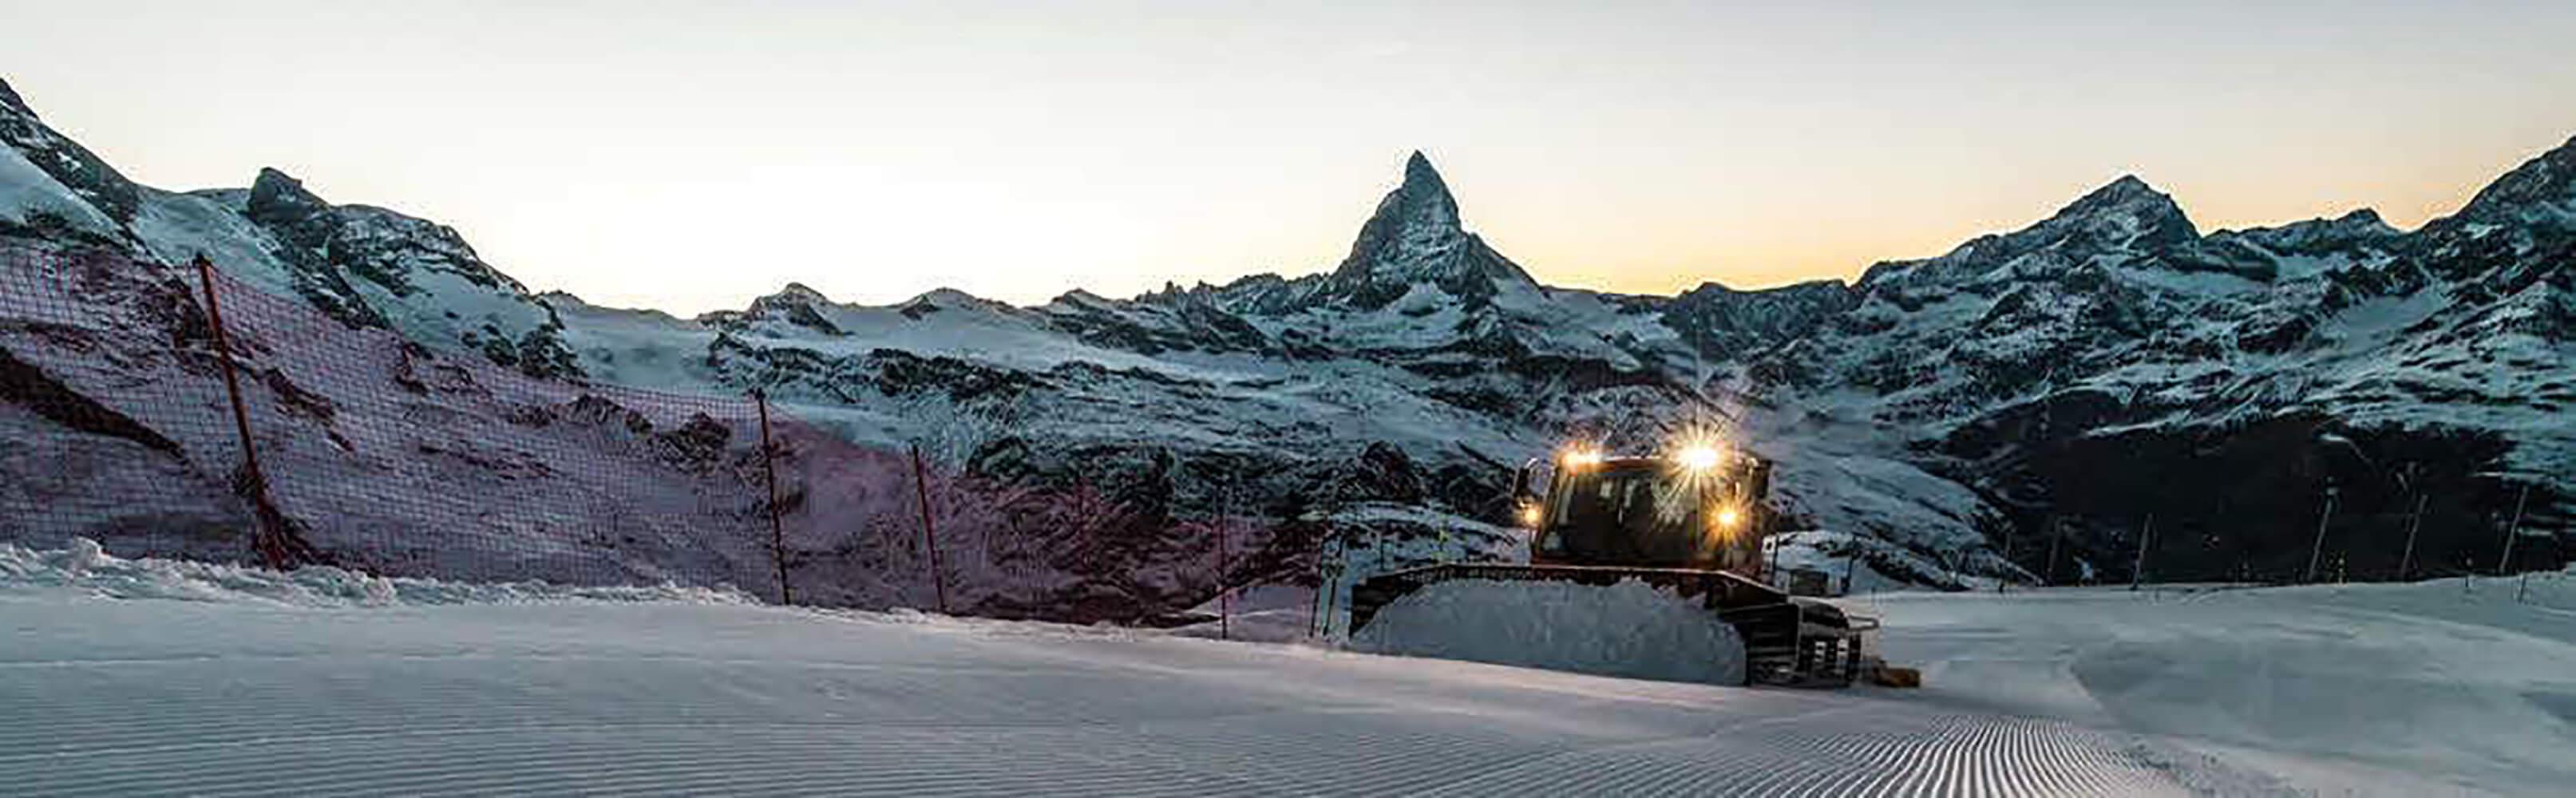 Pistenbully Fahrt Zermatt 1